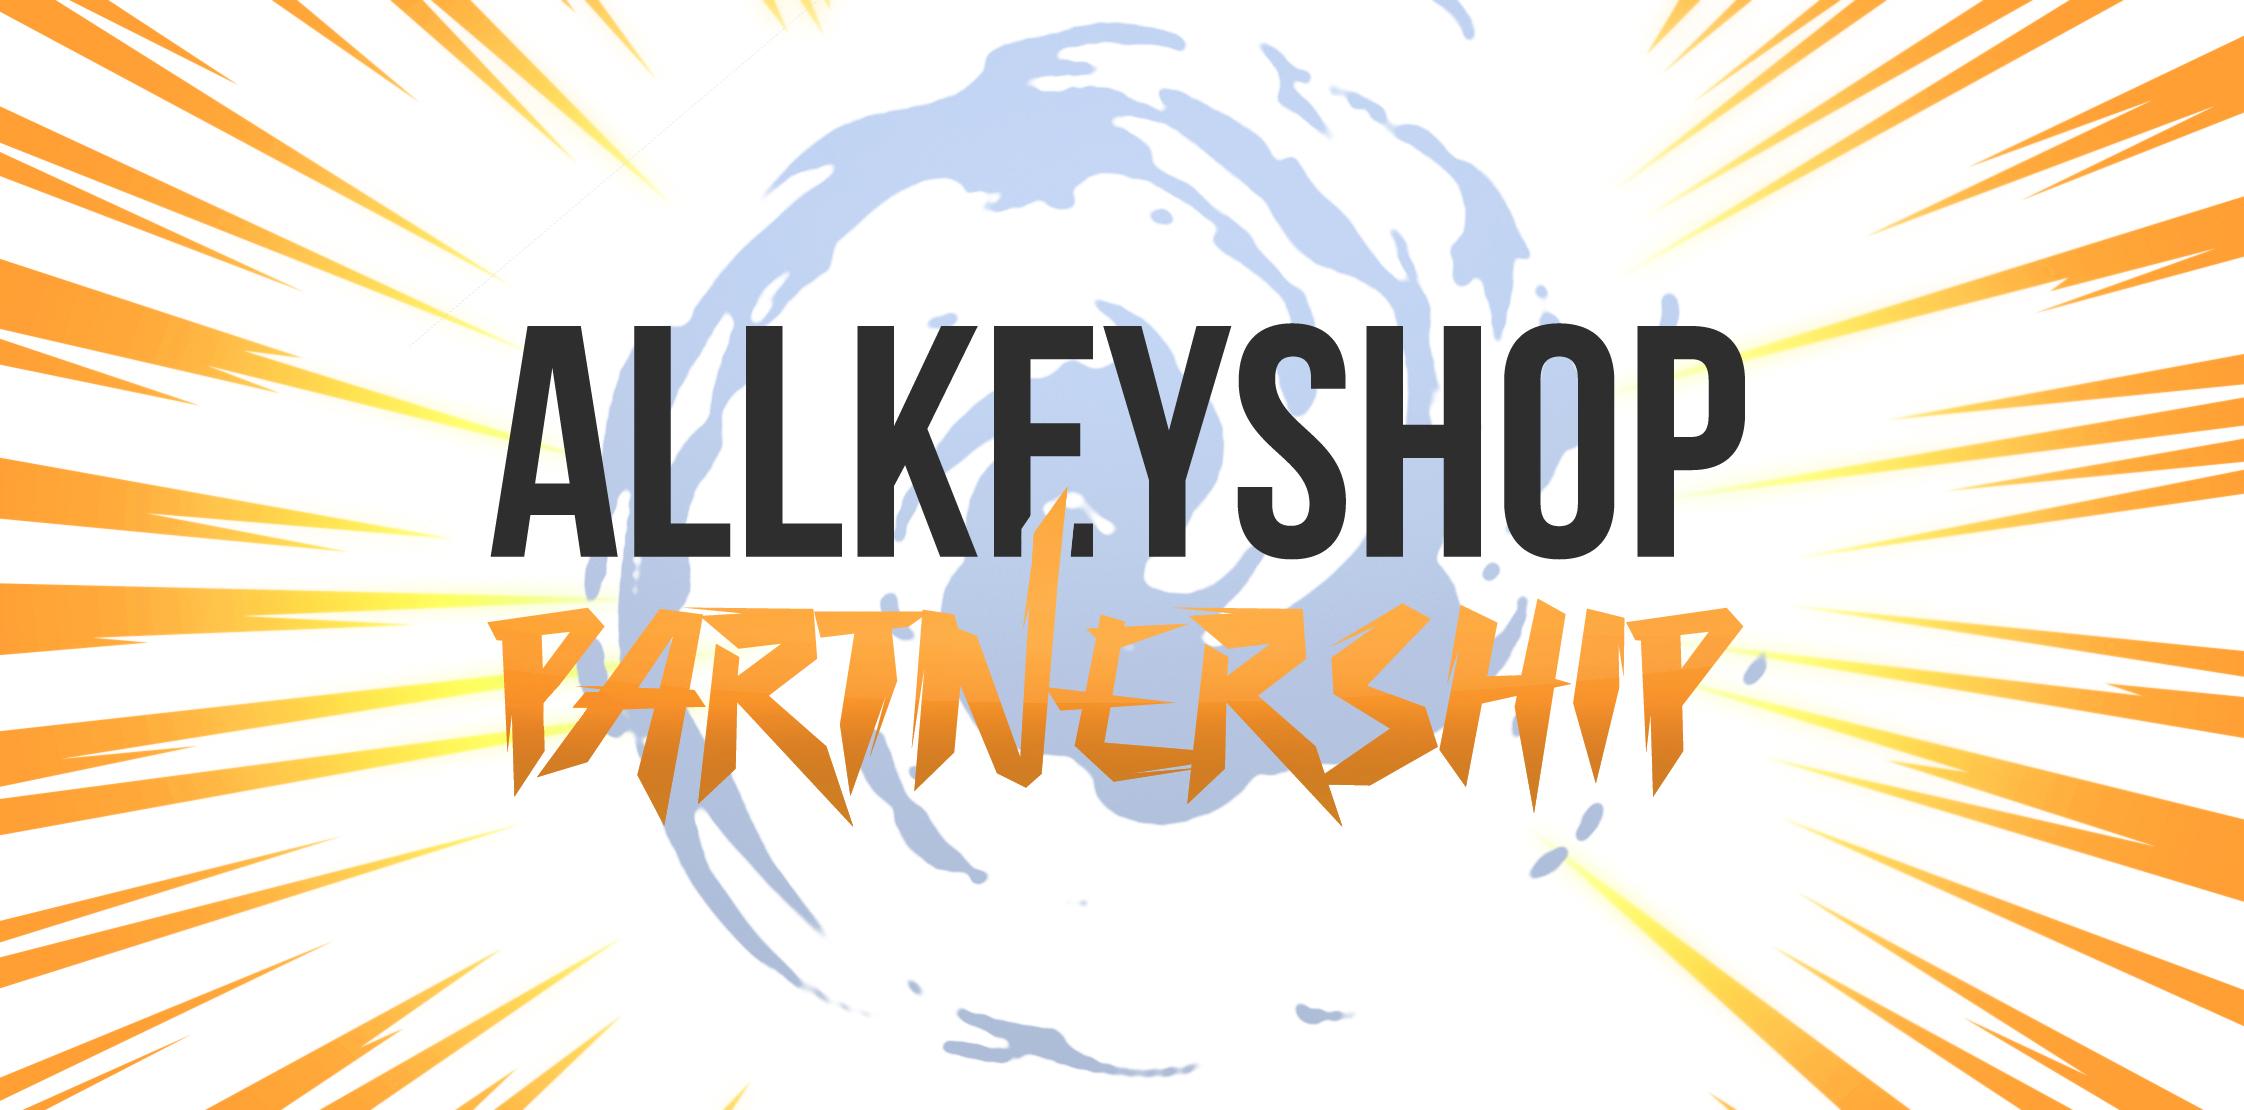 Allkeyshop Website Partnership